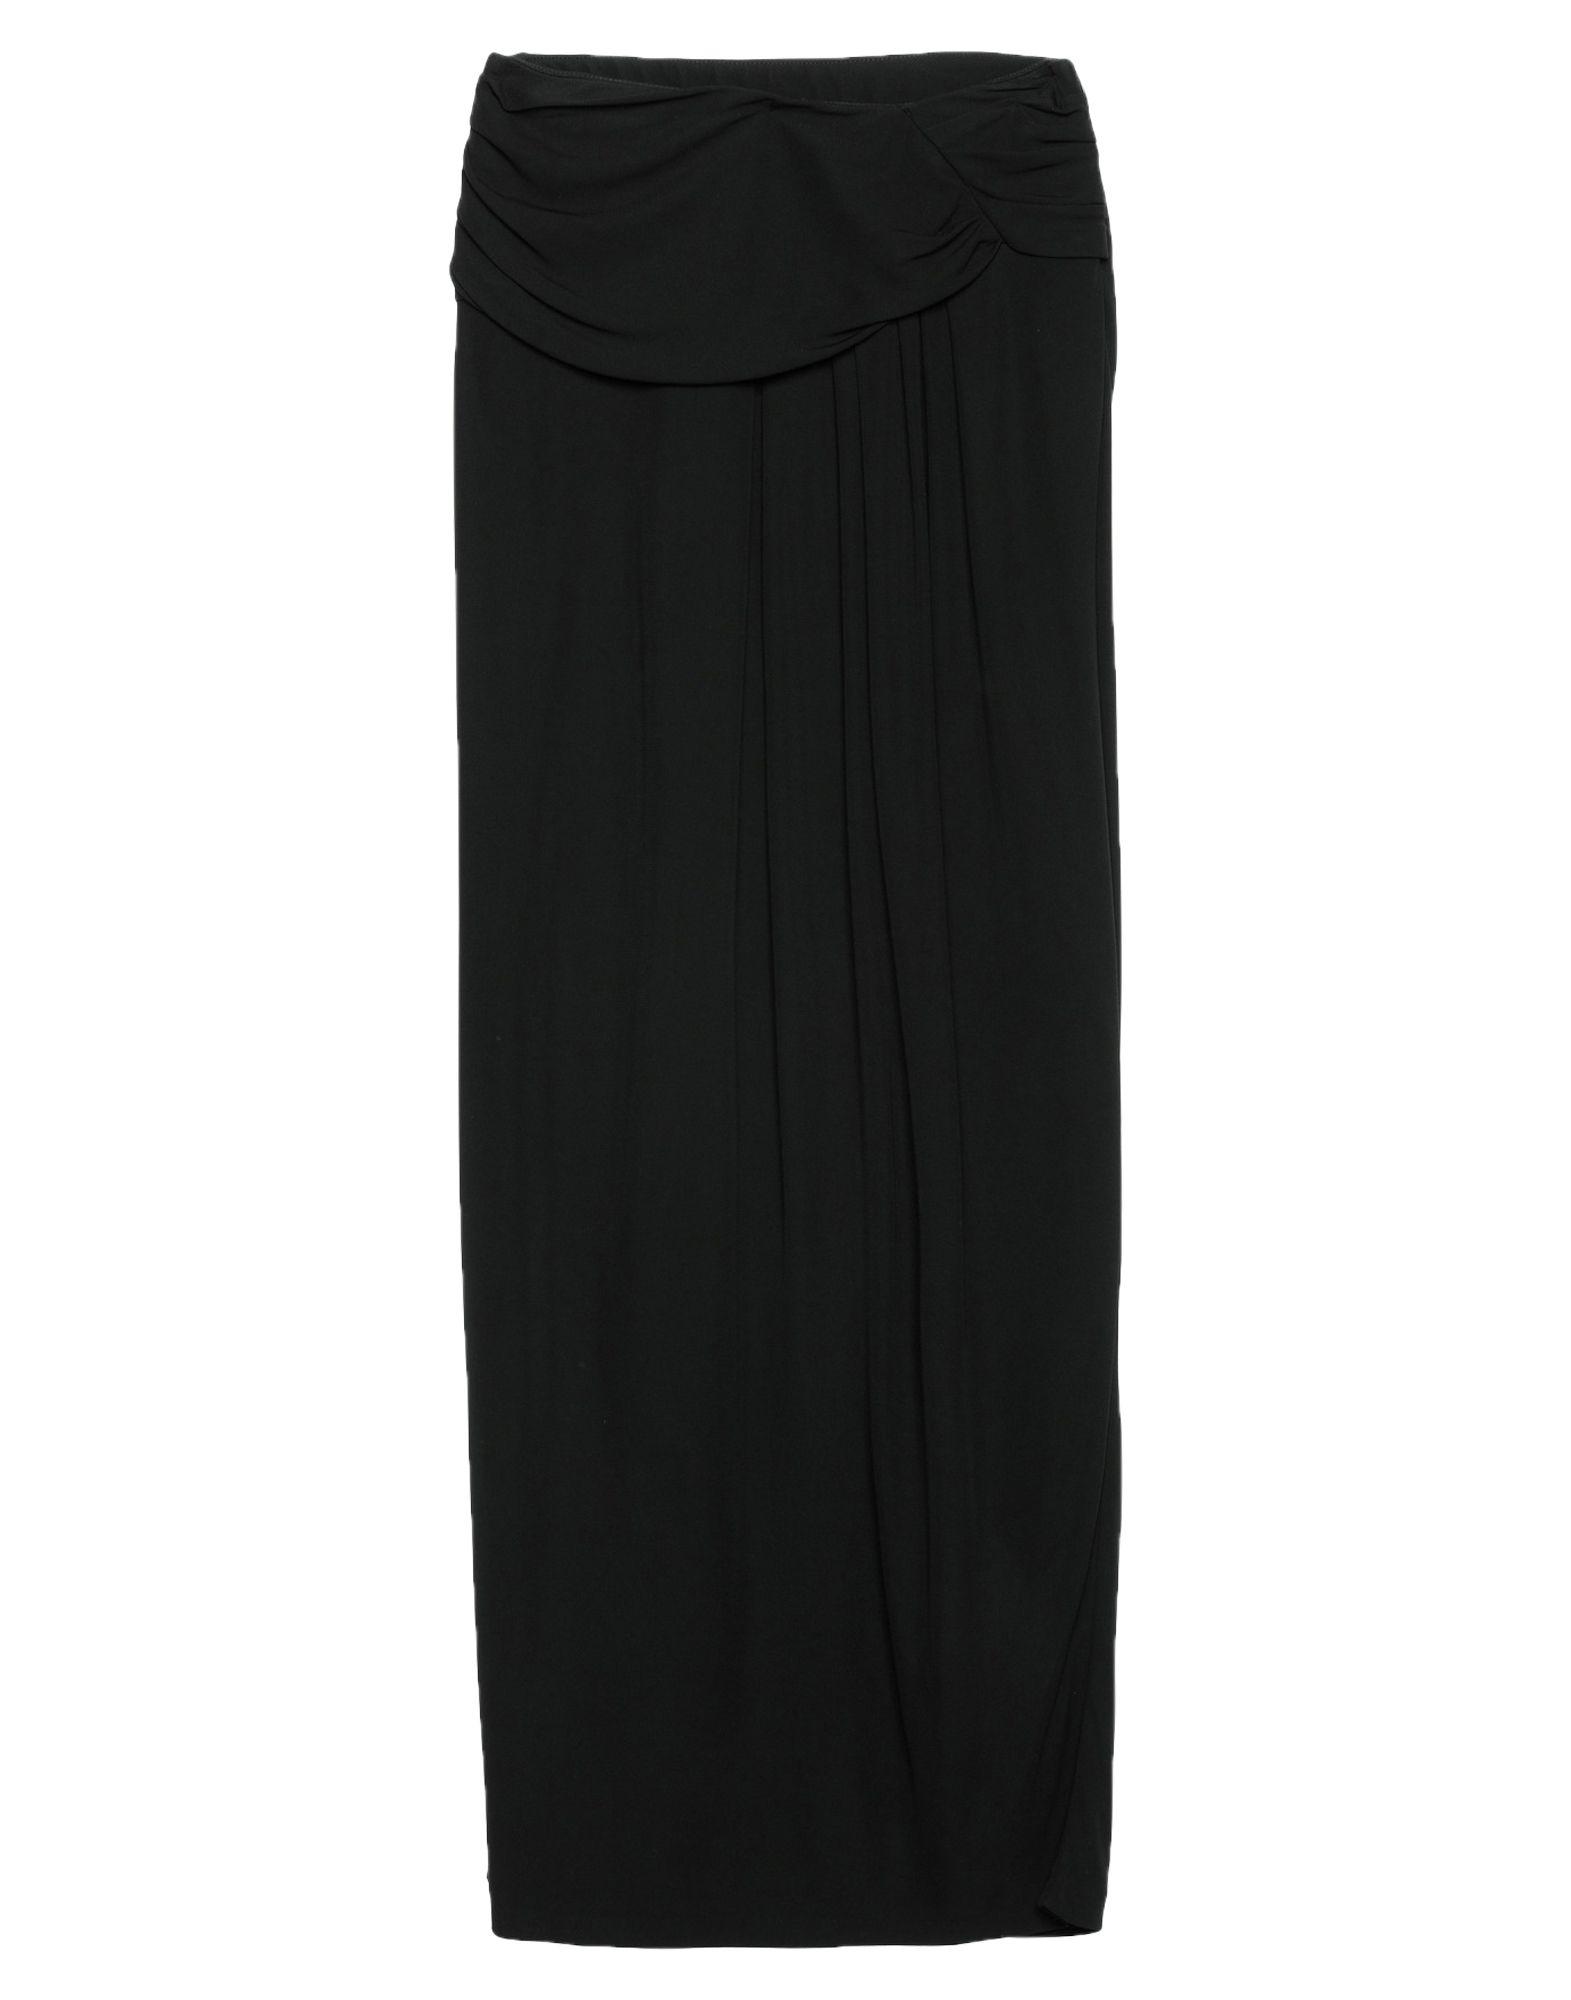 MAISON LAVINIATURRA Длинная юбка maison laviniaturra блузка